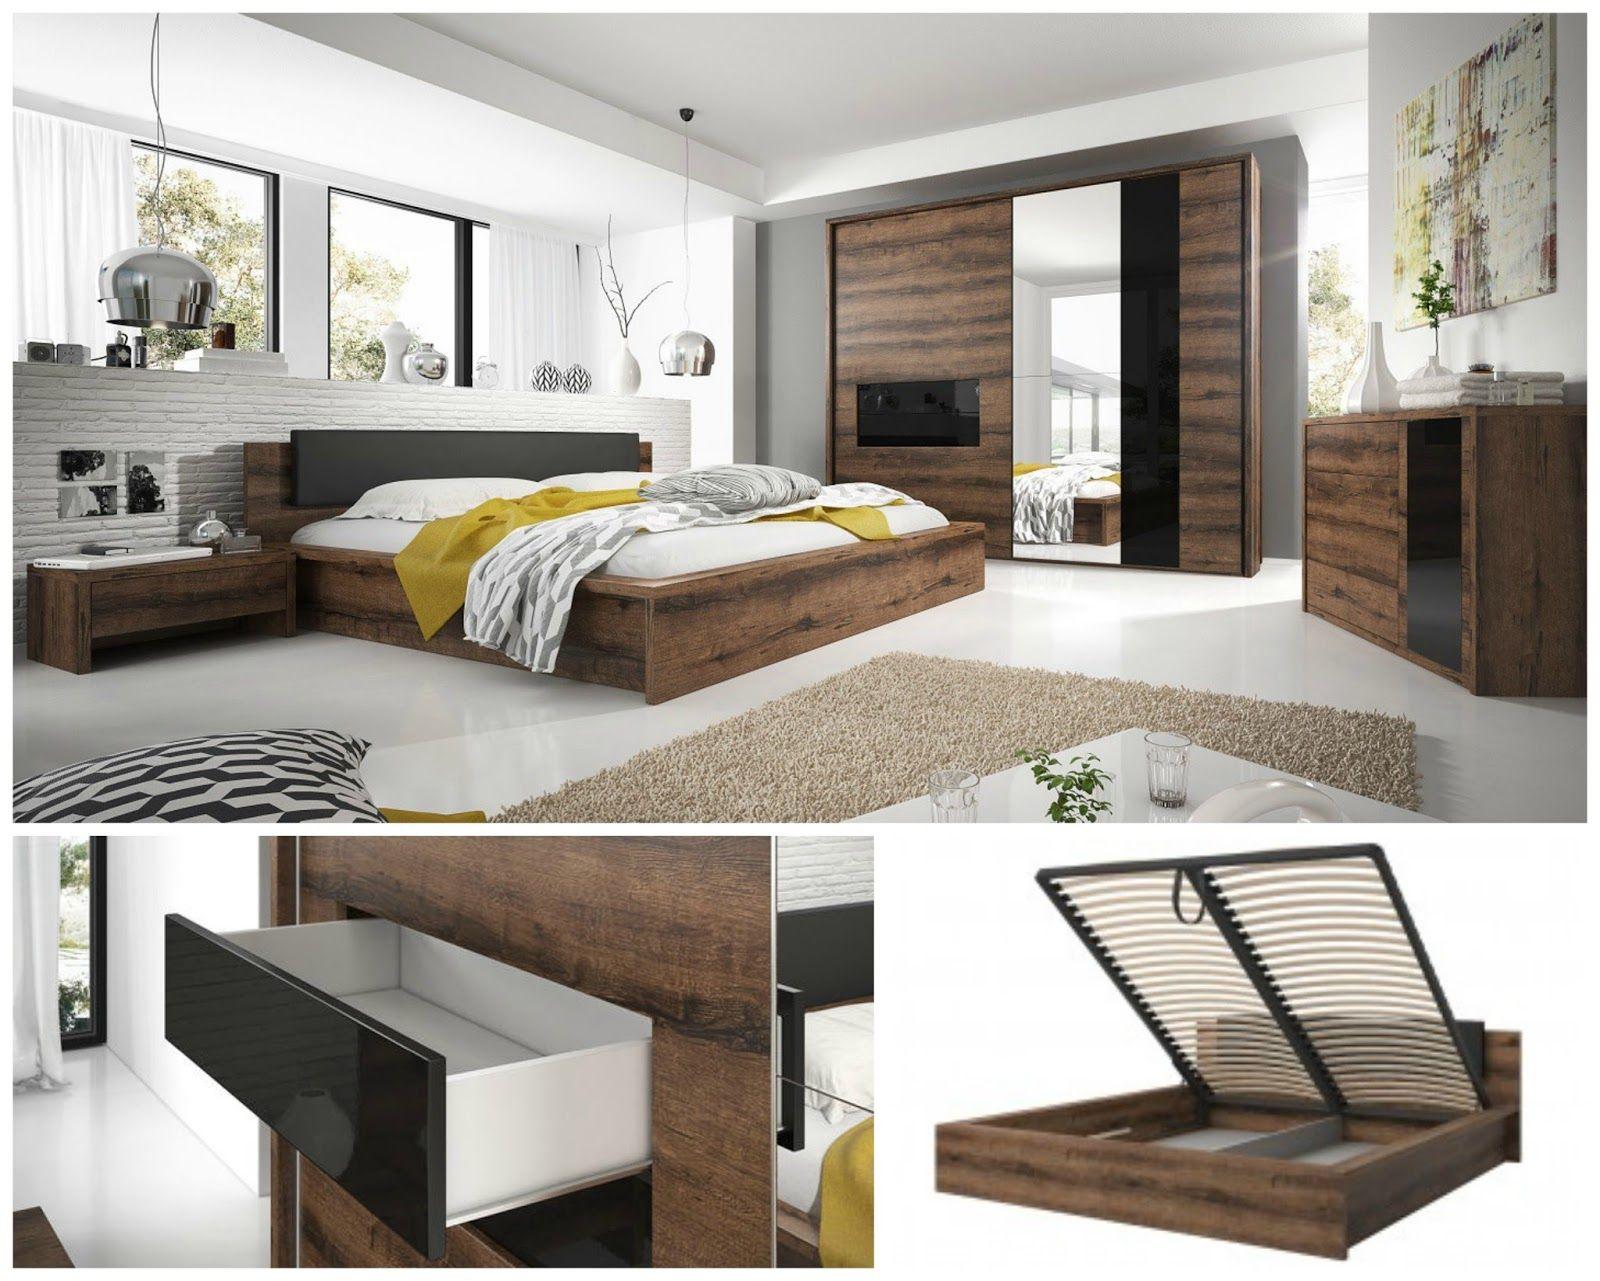 design möbel sale standort abbild oder fcfeabdfebdabd jpg